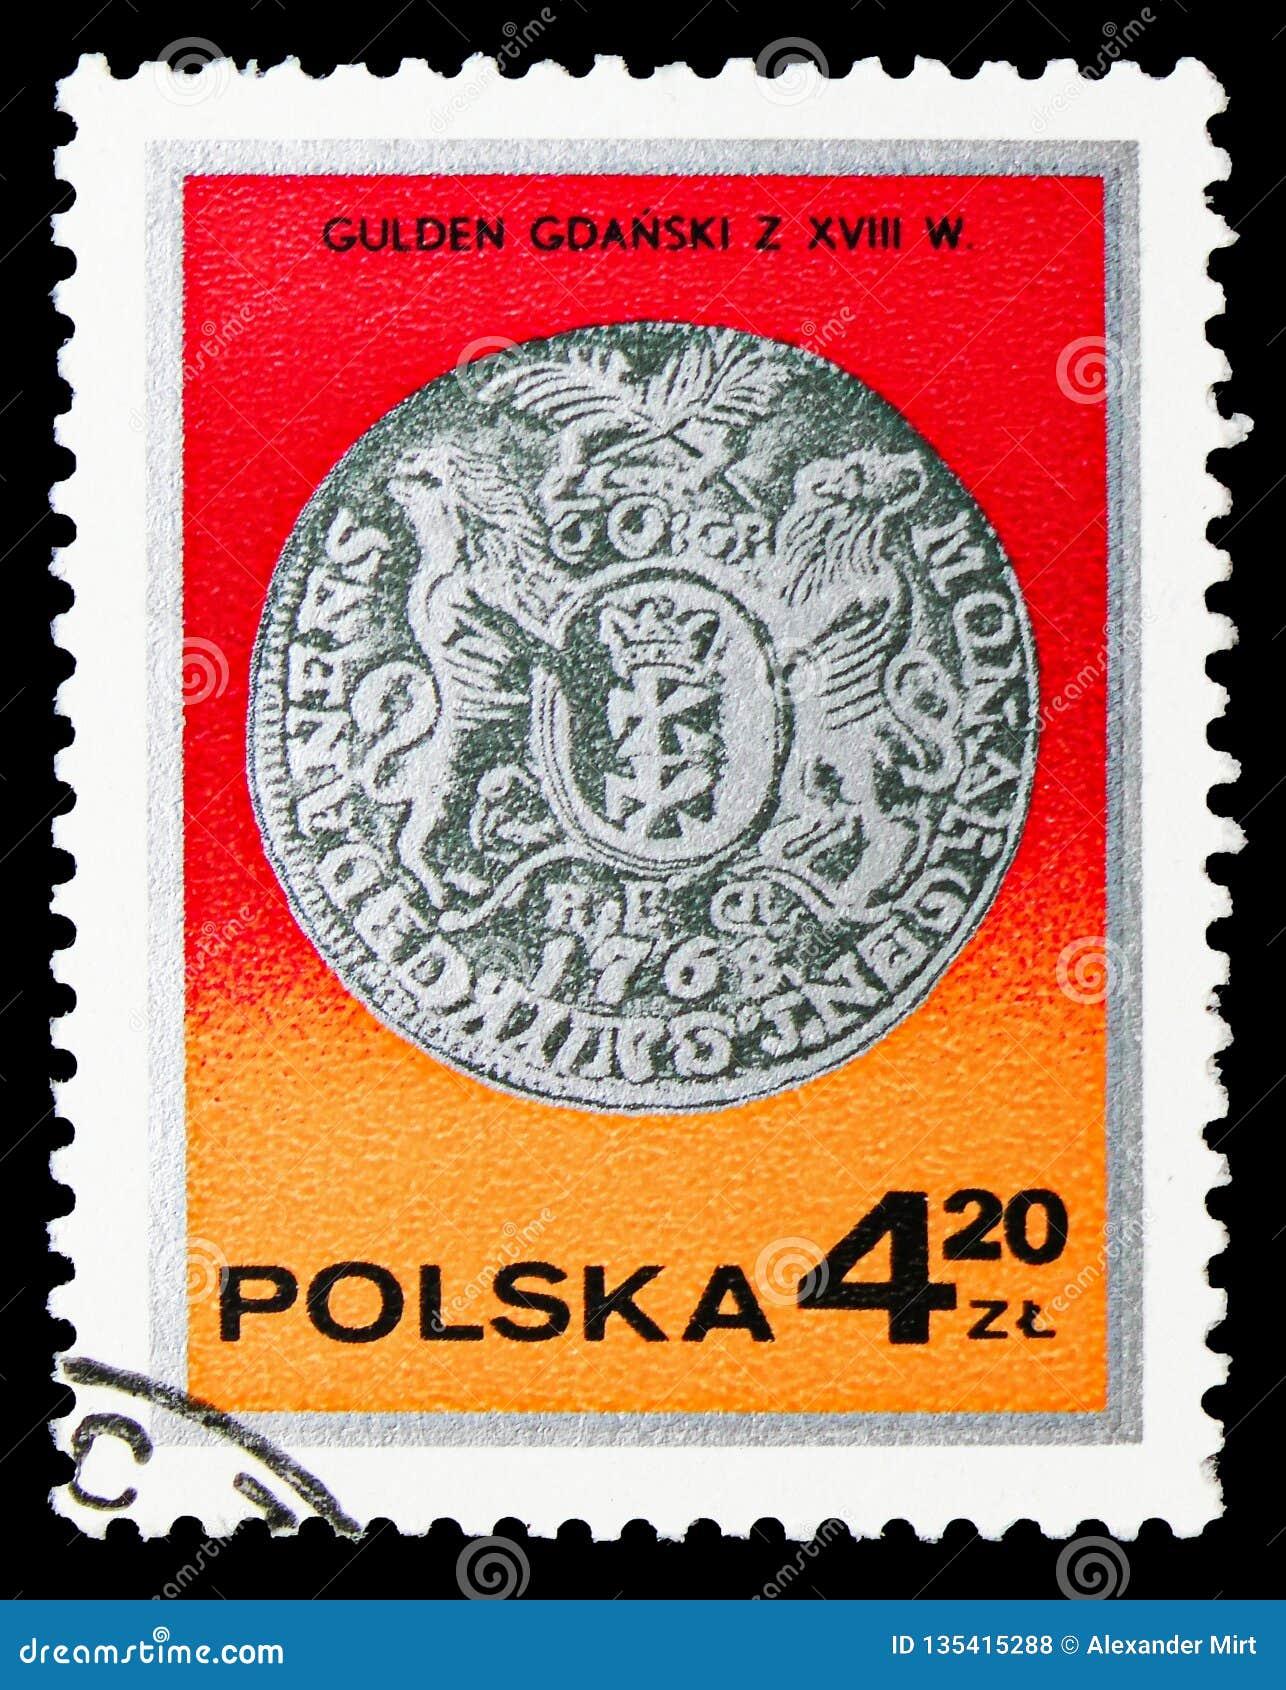 King Augustus III guilder, Gdansk, 18th century, Silver coins serie, circa 1977